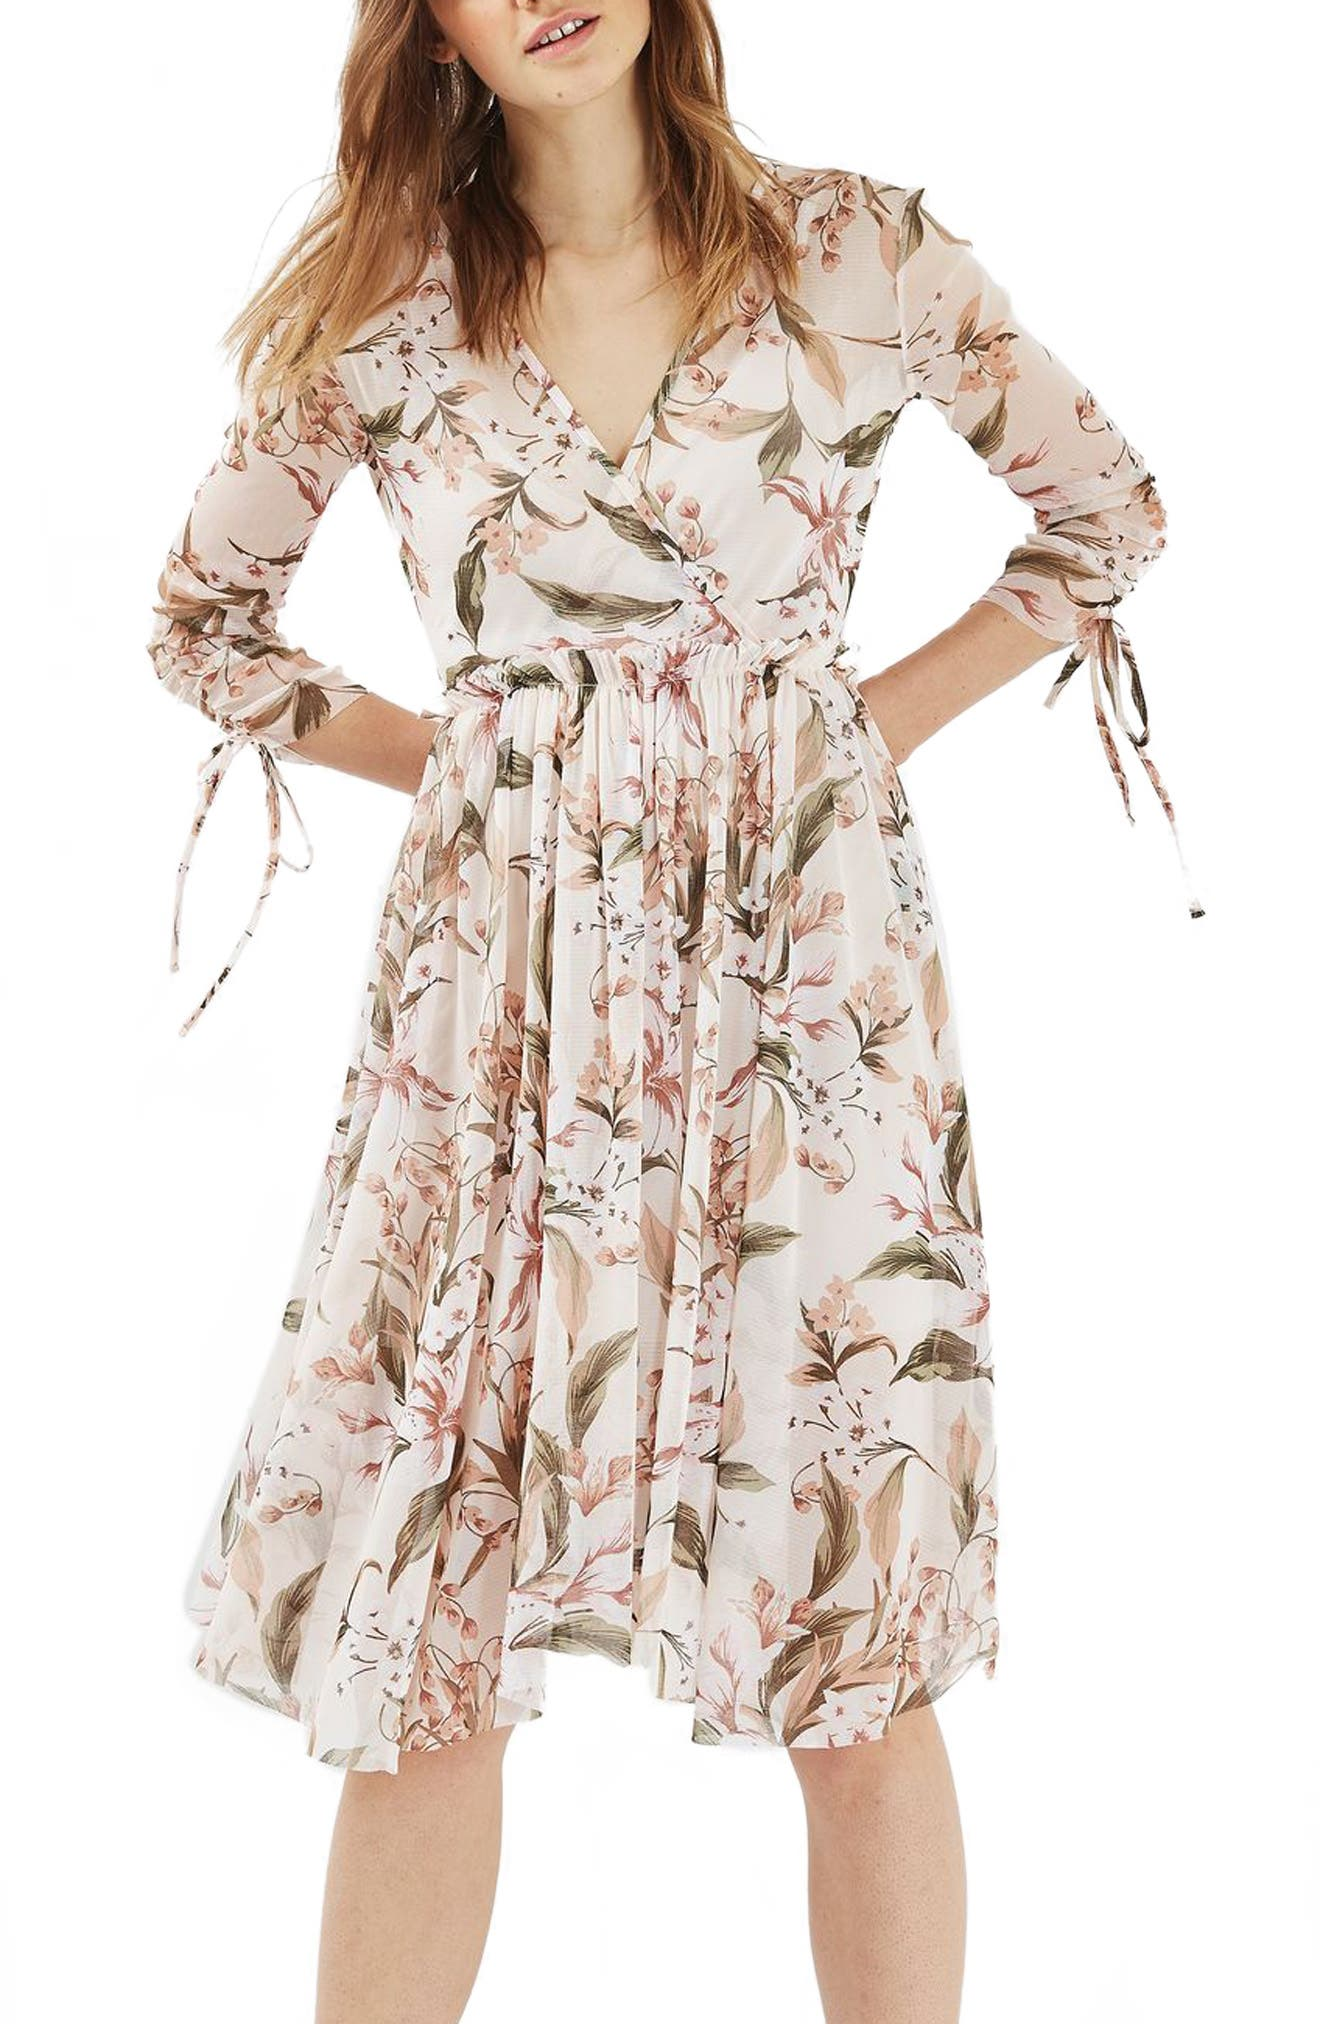 Lily Floral Mesh Dress,                             Main thumbnail 1, color,                             900